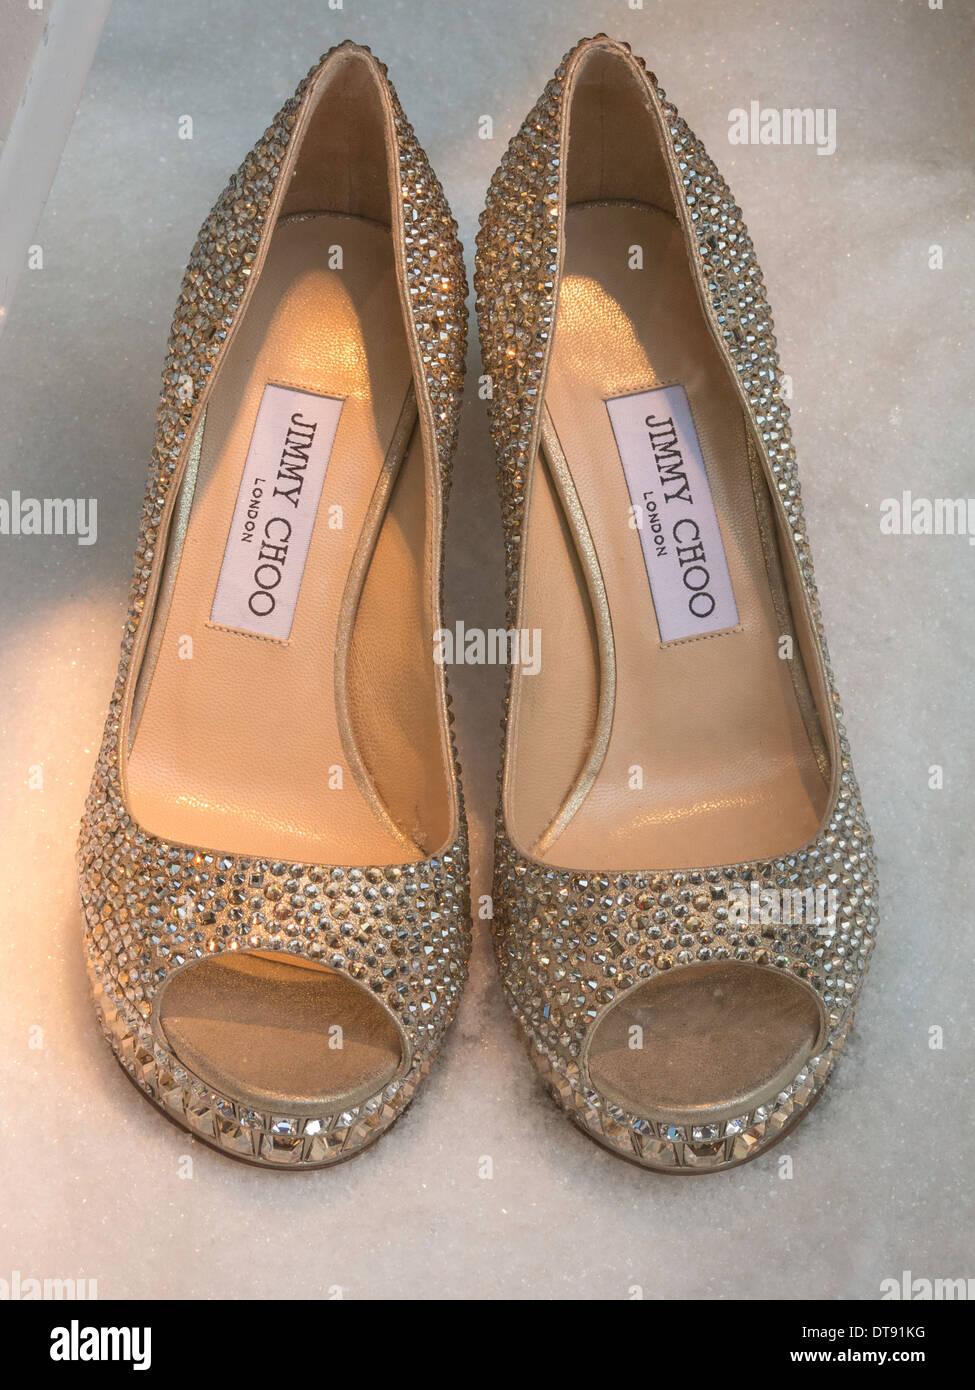 Paar von Jimmy Choo High Heel Schuhe, Saks, NYC, USA Stockbild